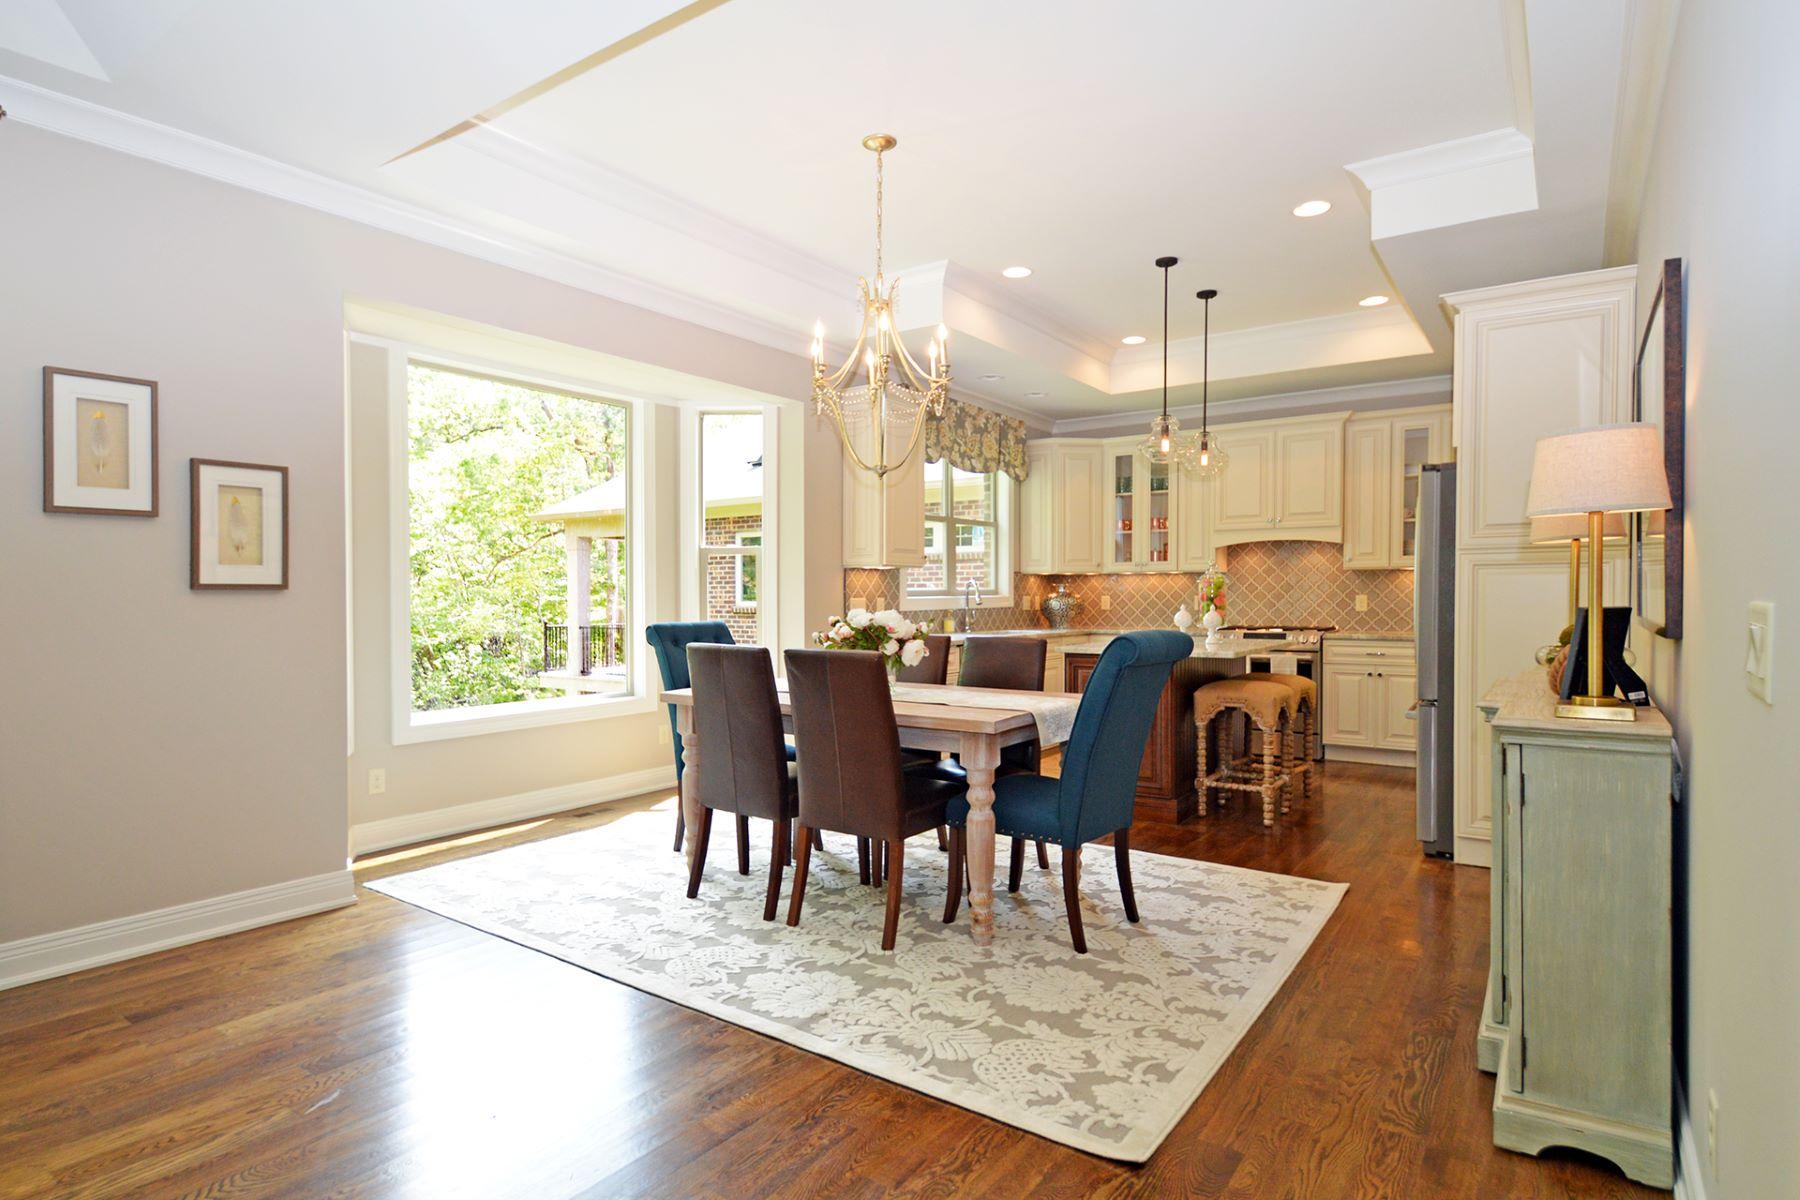 Single Family Home for Sale at Creekside Pointe 4018 Creekside Pointe 9415 Plainfield Rd. - GPS Coordinates Blue Ash, Cincinnati, Ohio, 45236 United States